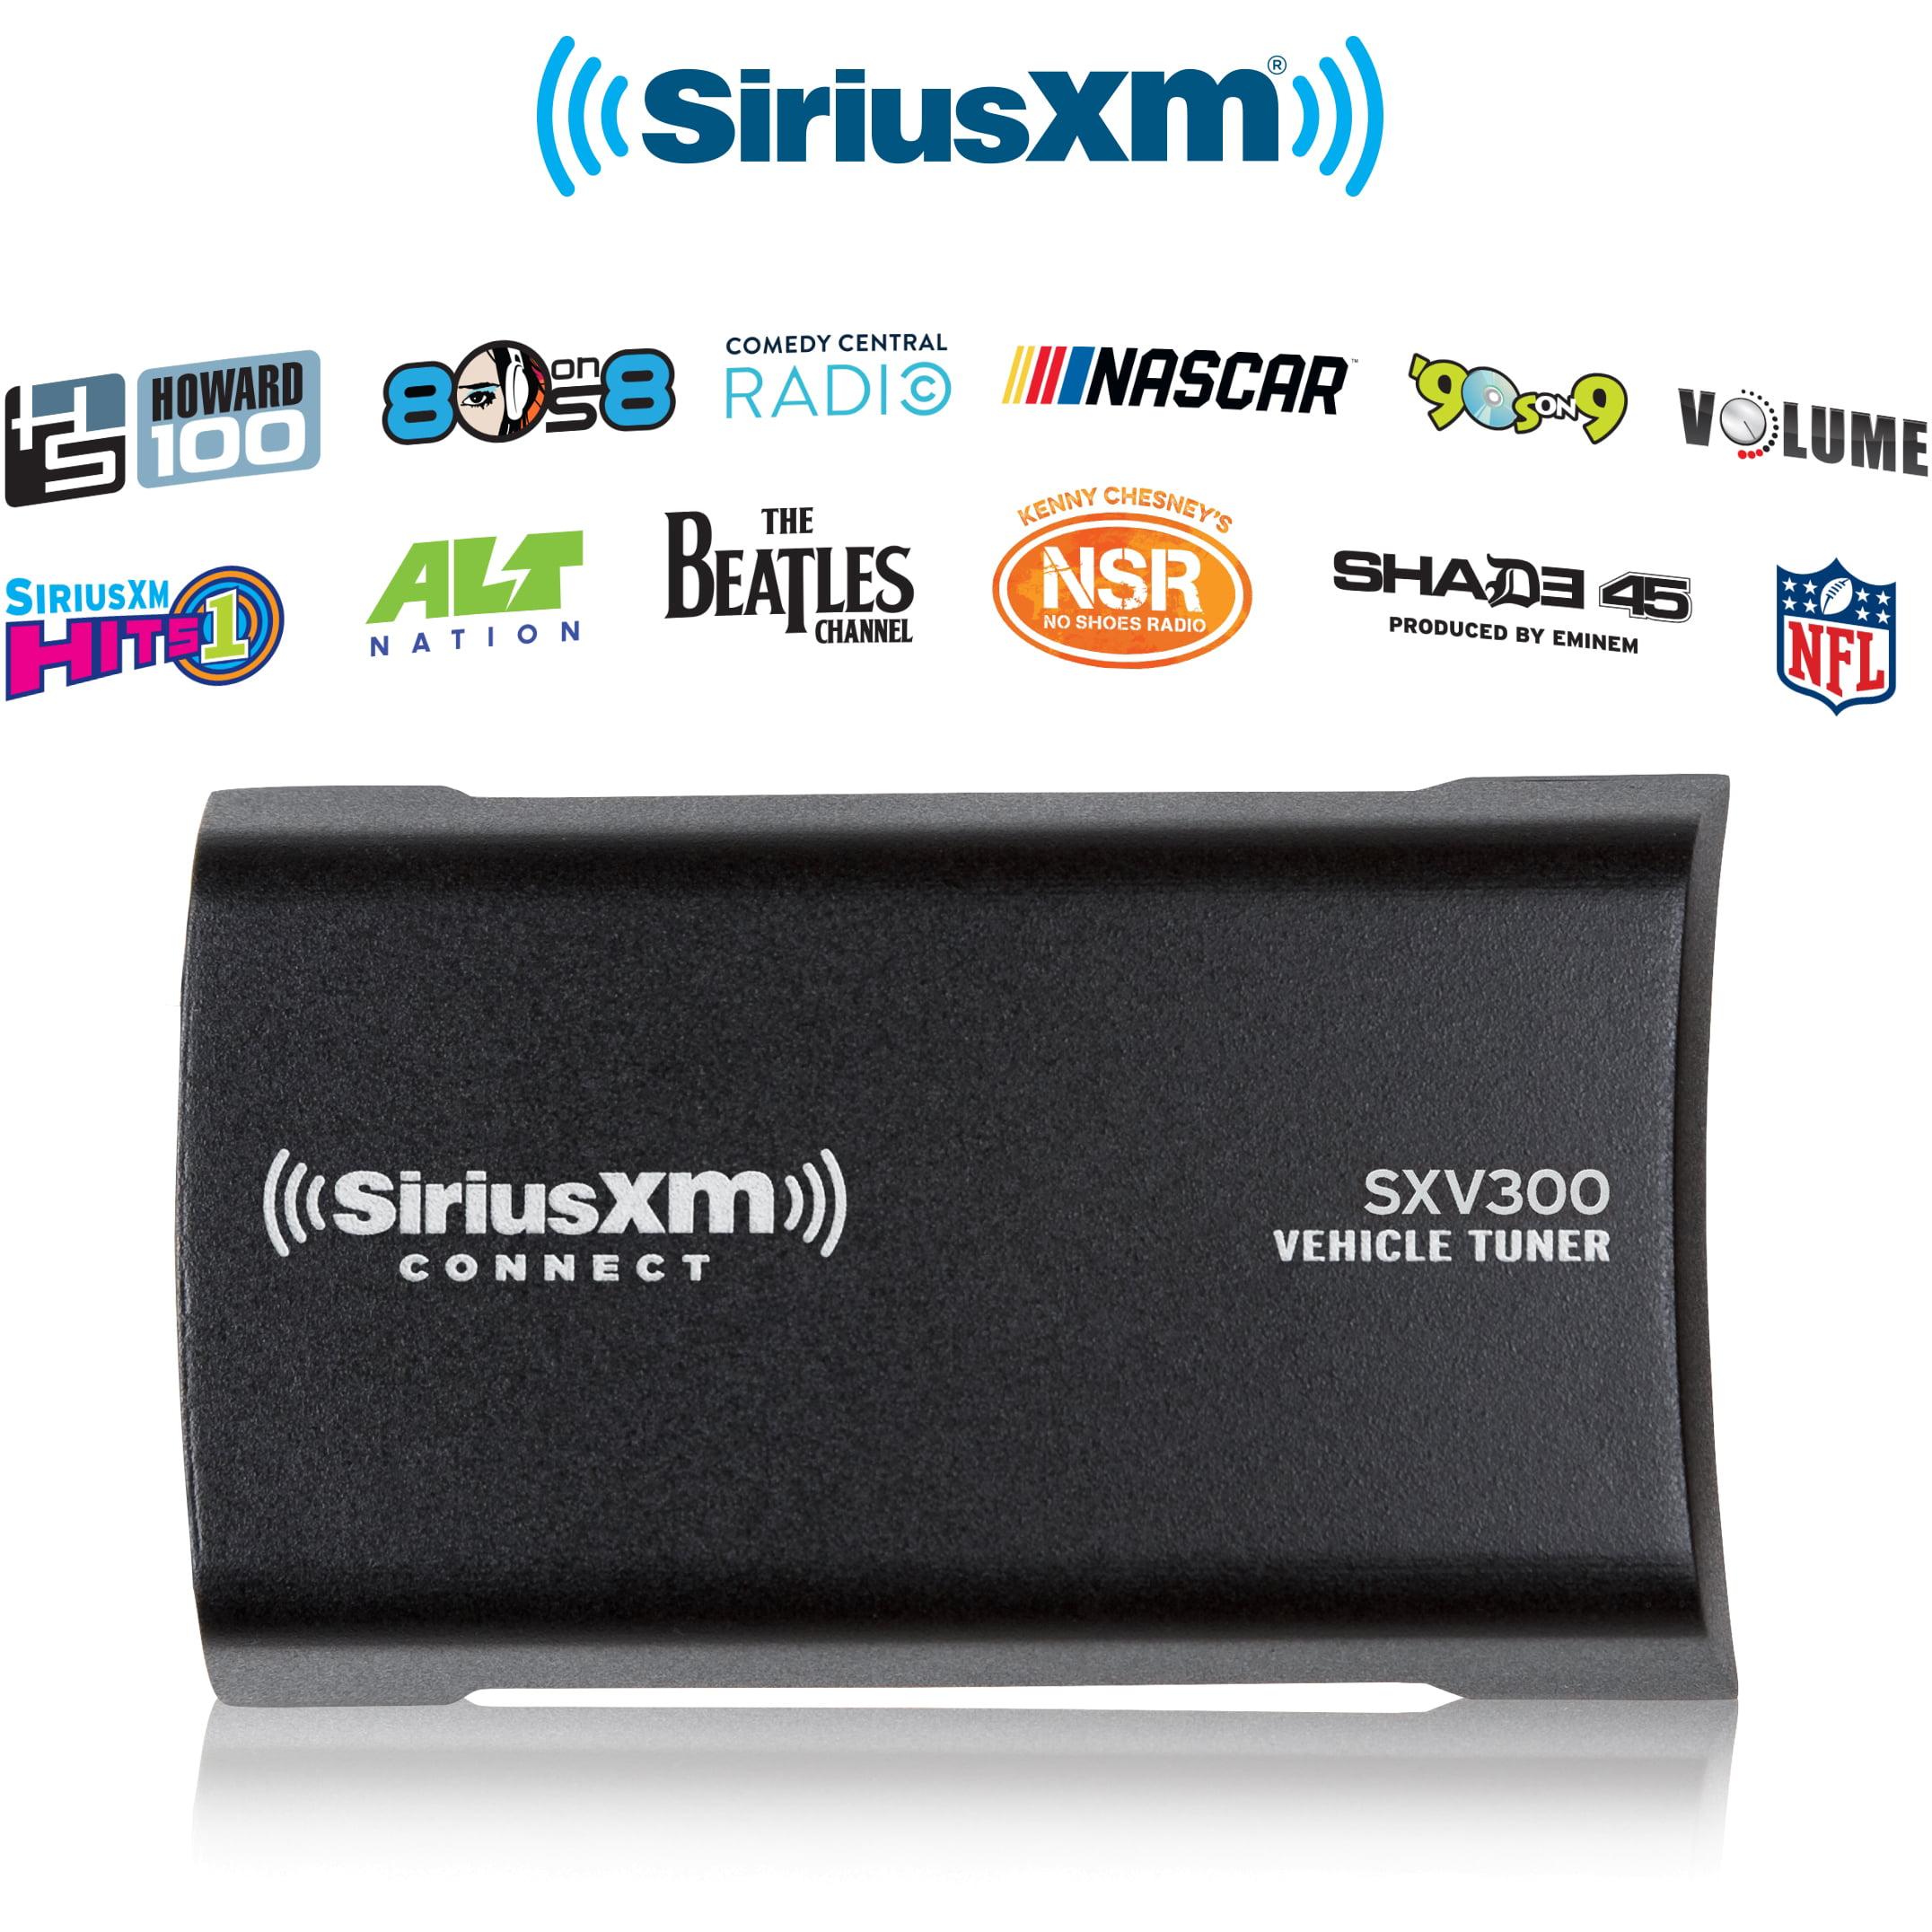 Black SiriusXM Connect Vehicle Tuner Kit for Satellite Radio